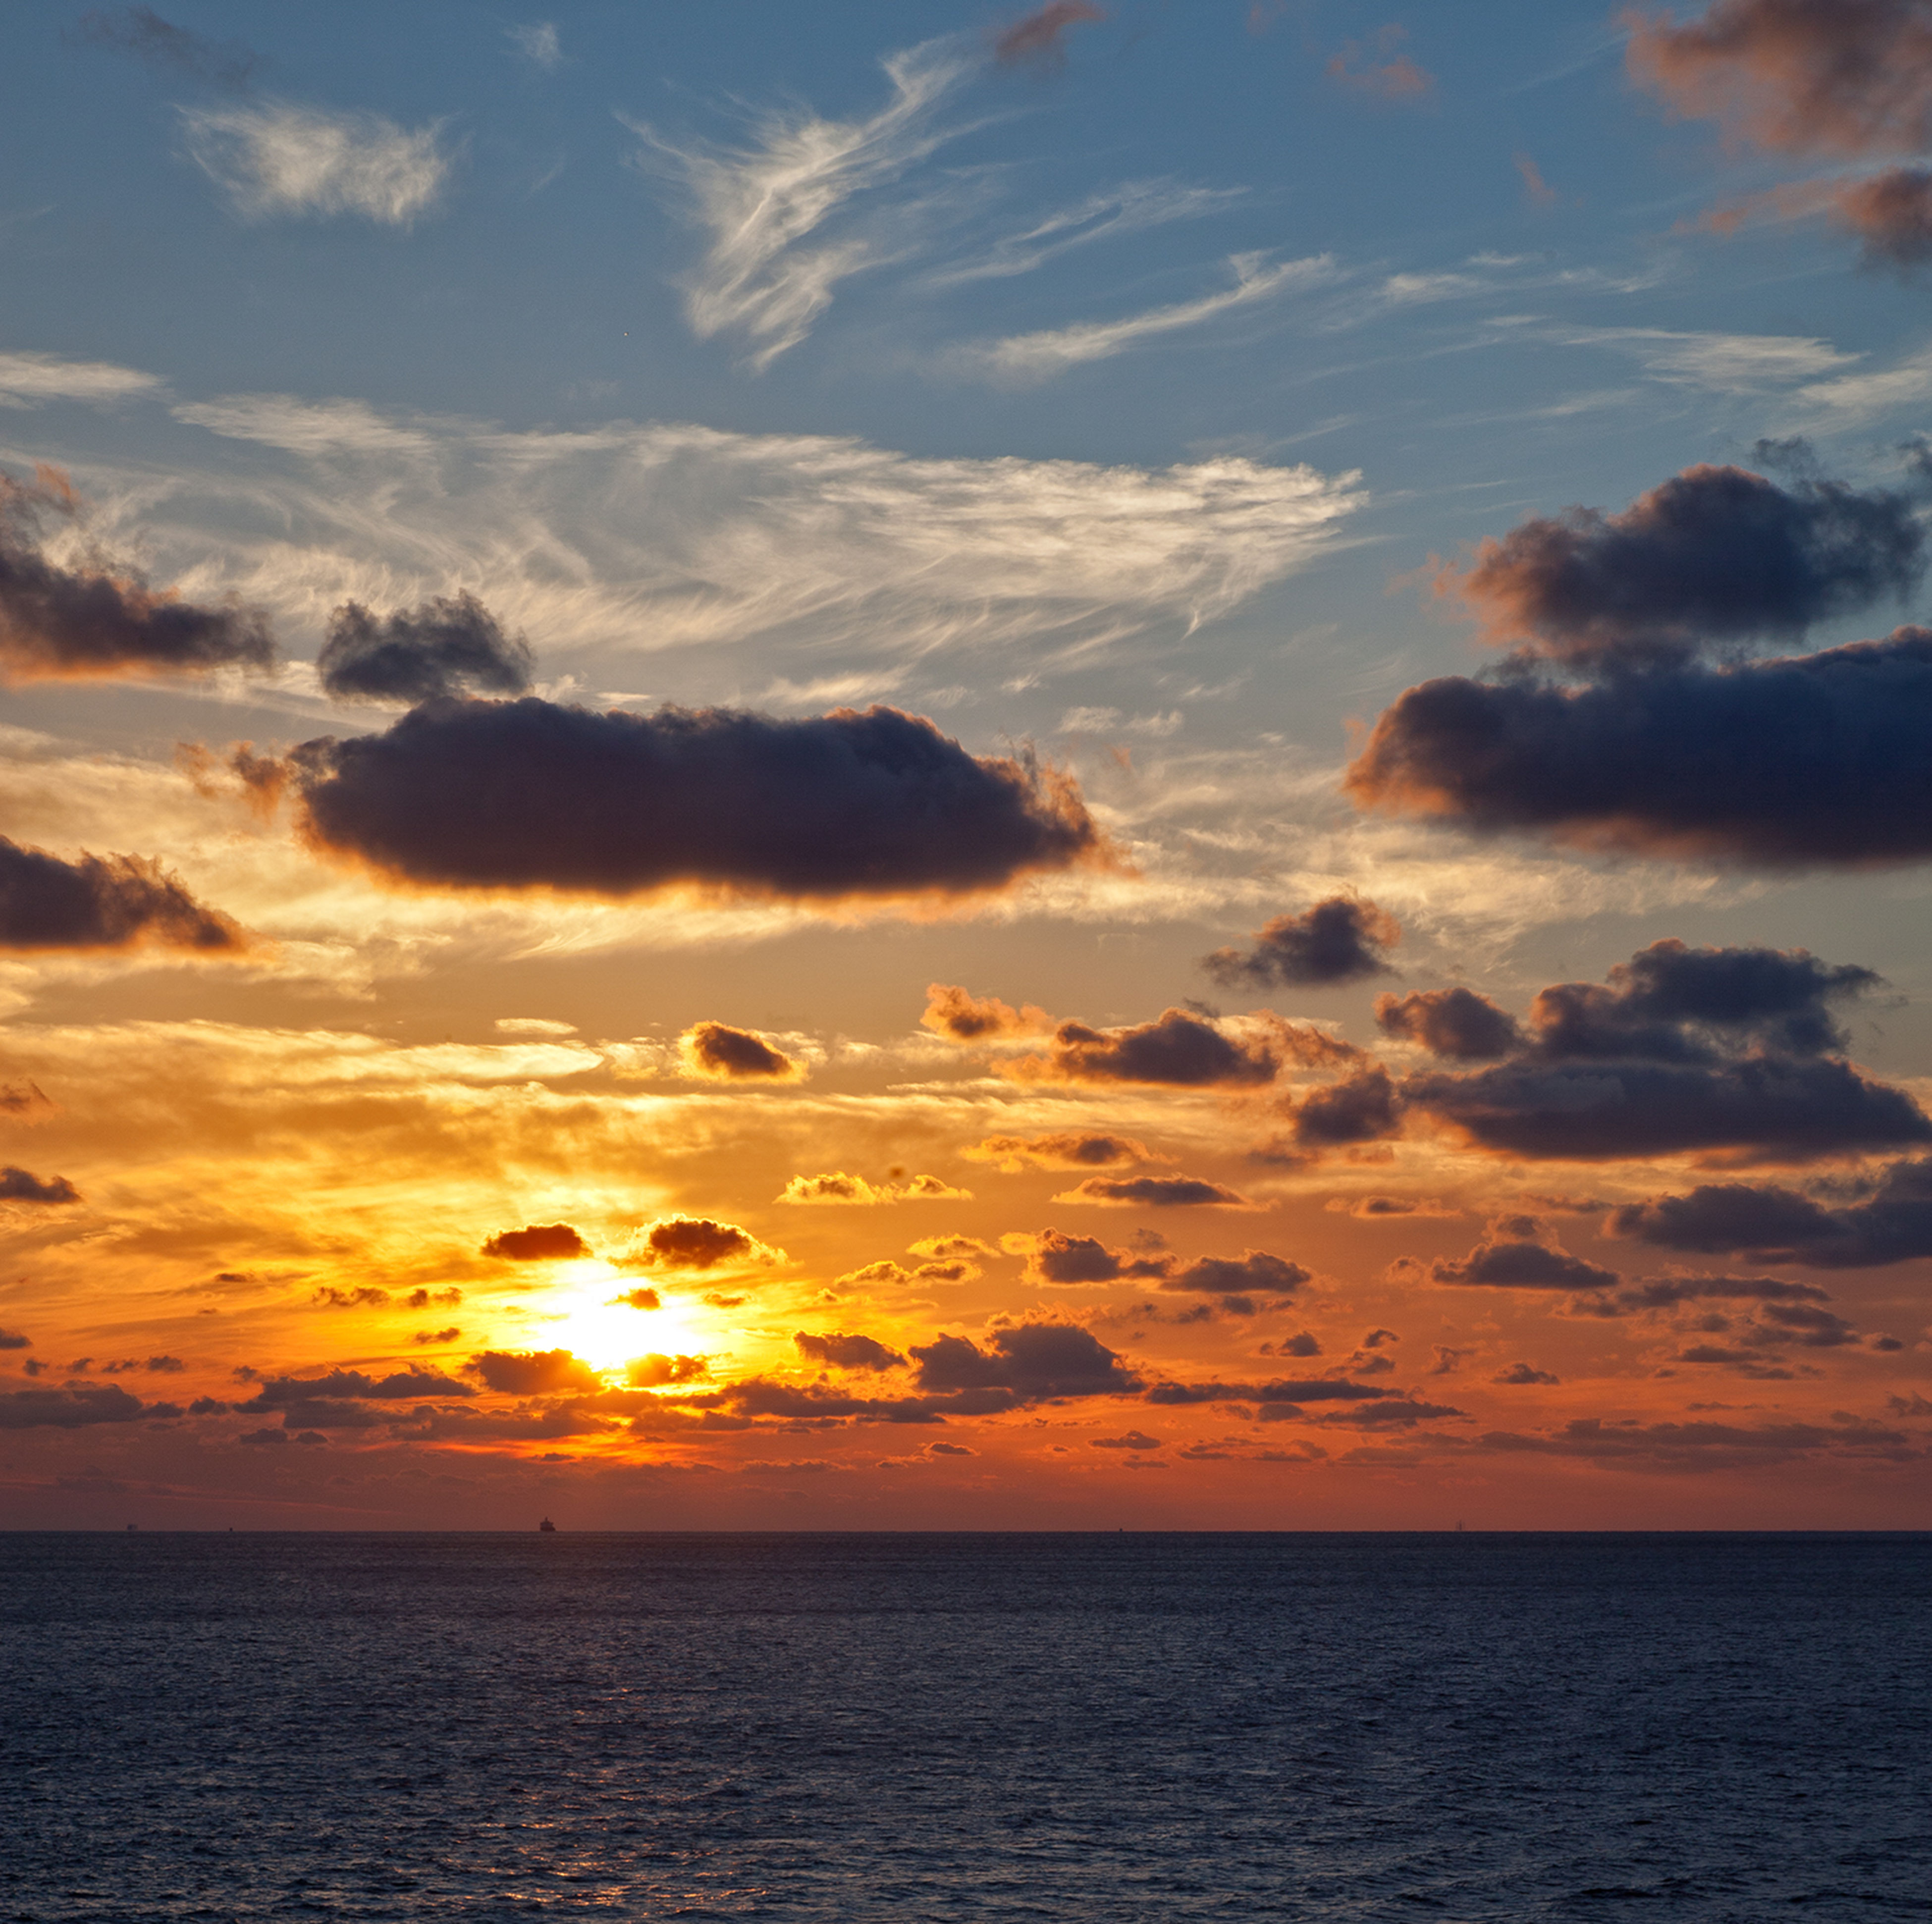 sea, sunset, horizon over water, scenics, sun, water, tranquil scene, beauty in nature, sky, tranquility, waterfront, orange color, idyllic, nature, cloud - sky, cloud, sunlight, seascape, reflection, sunbeam